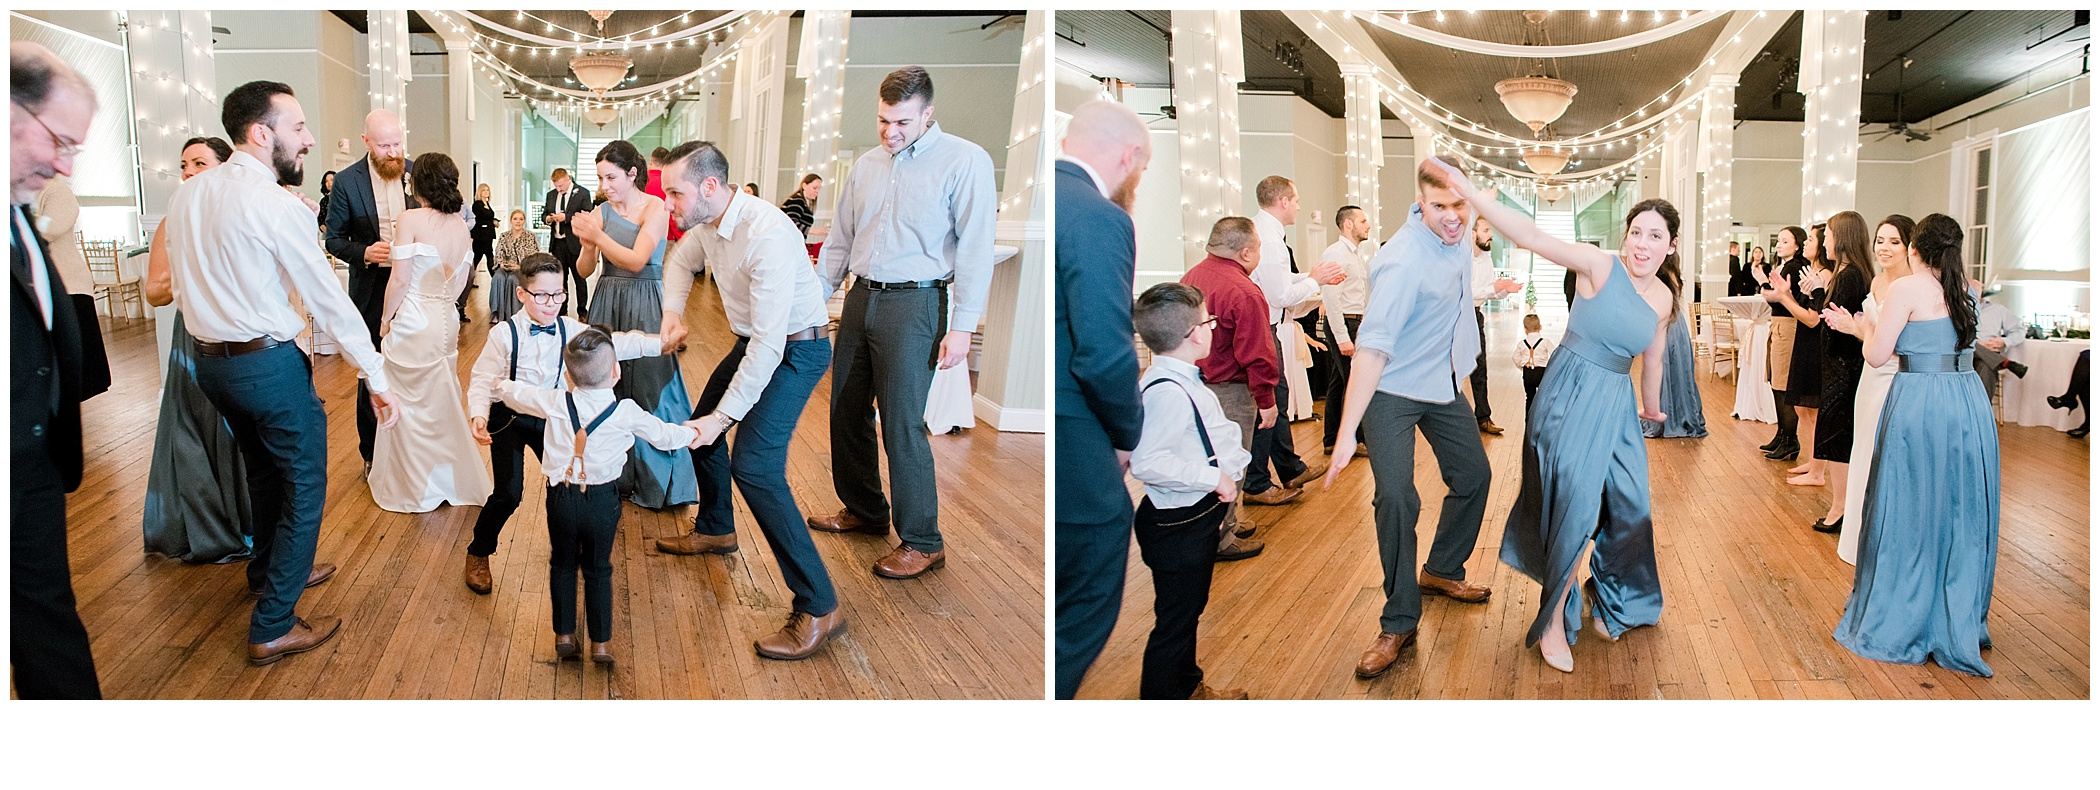 Virginia Wedding Photographer_6401.jpg